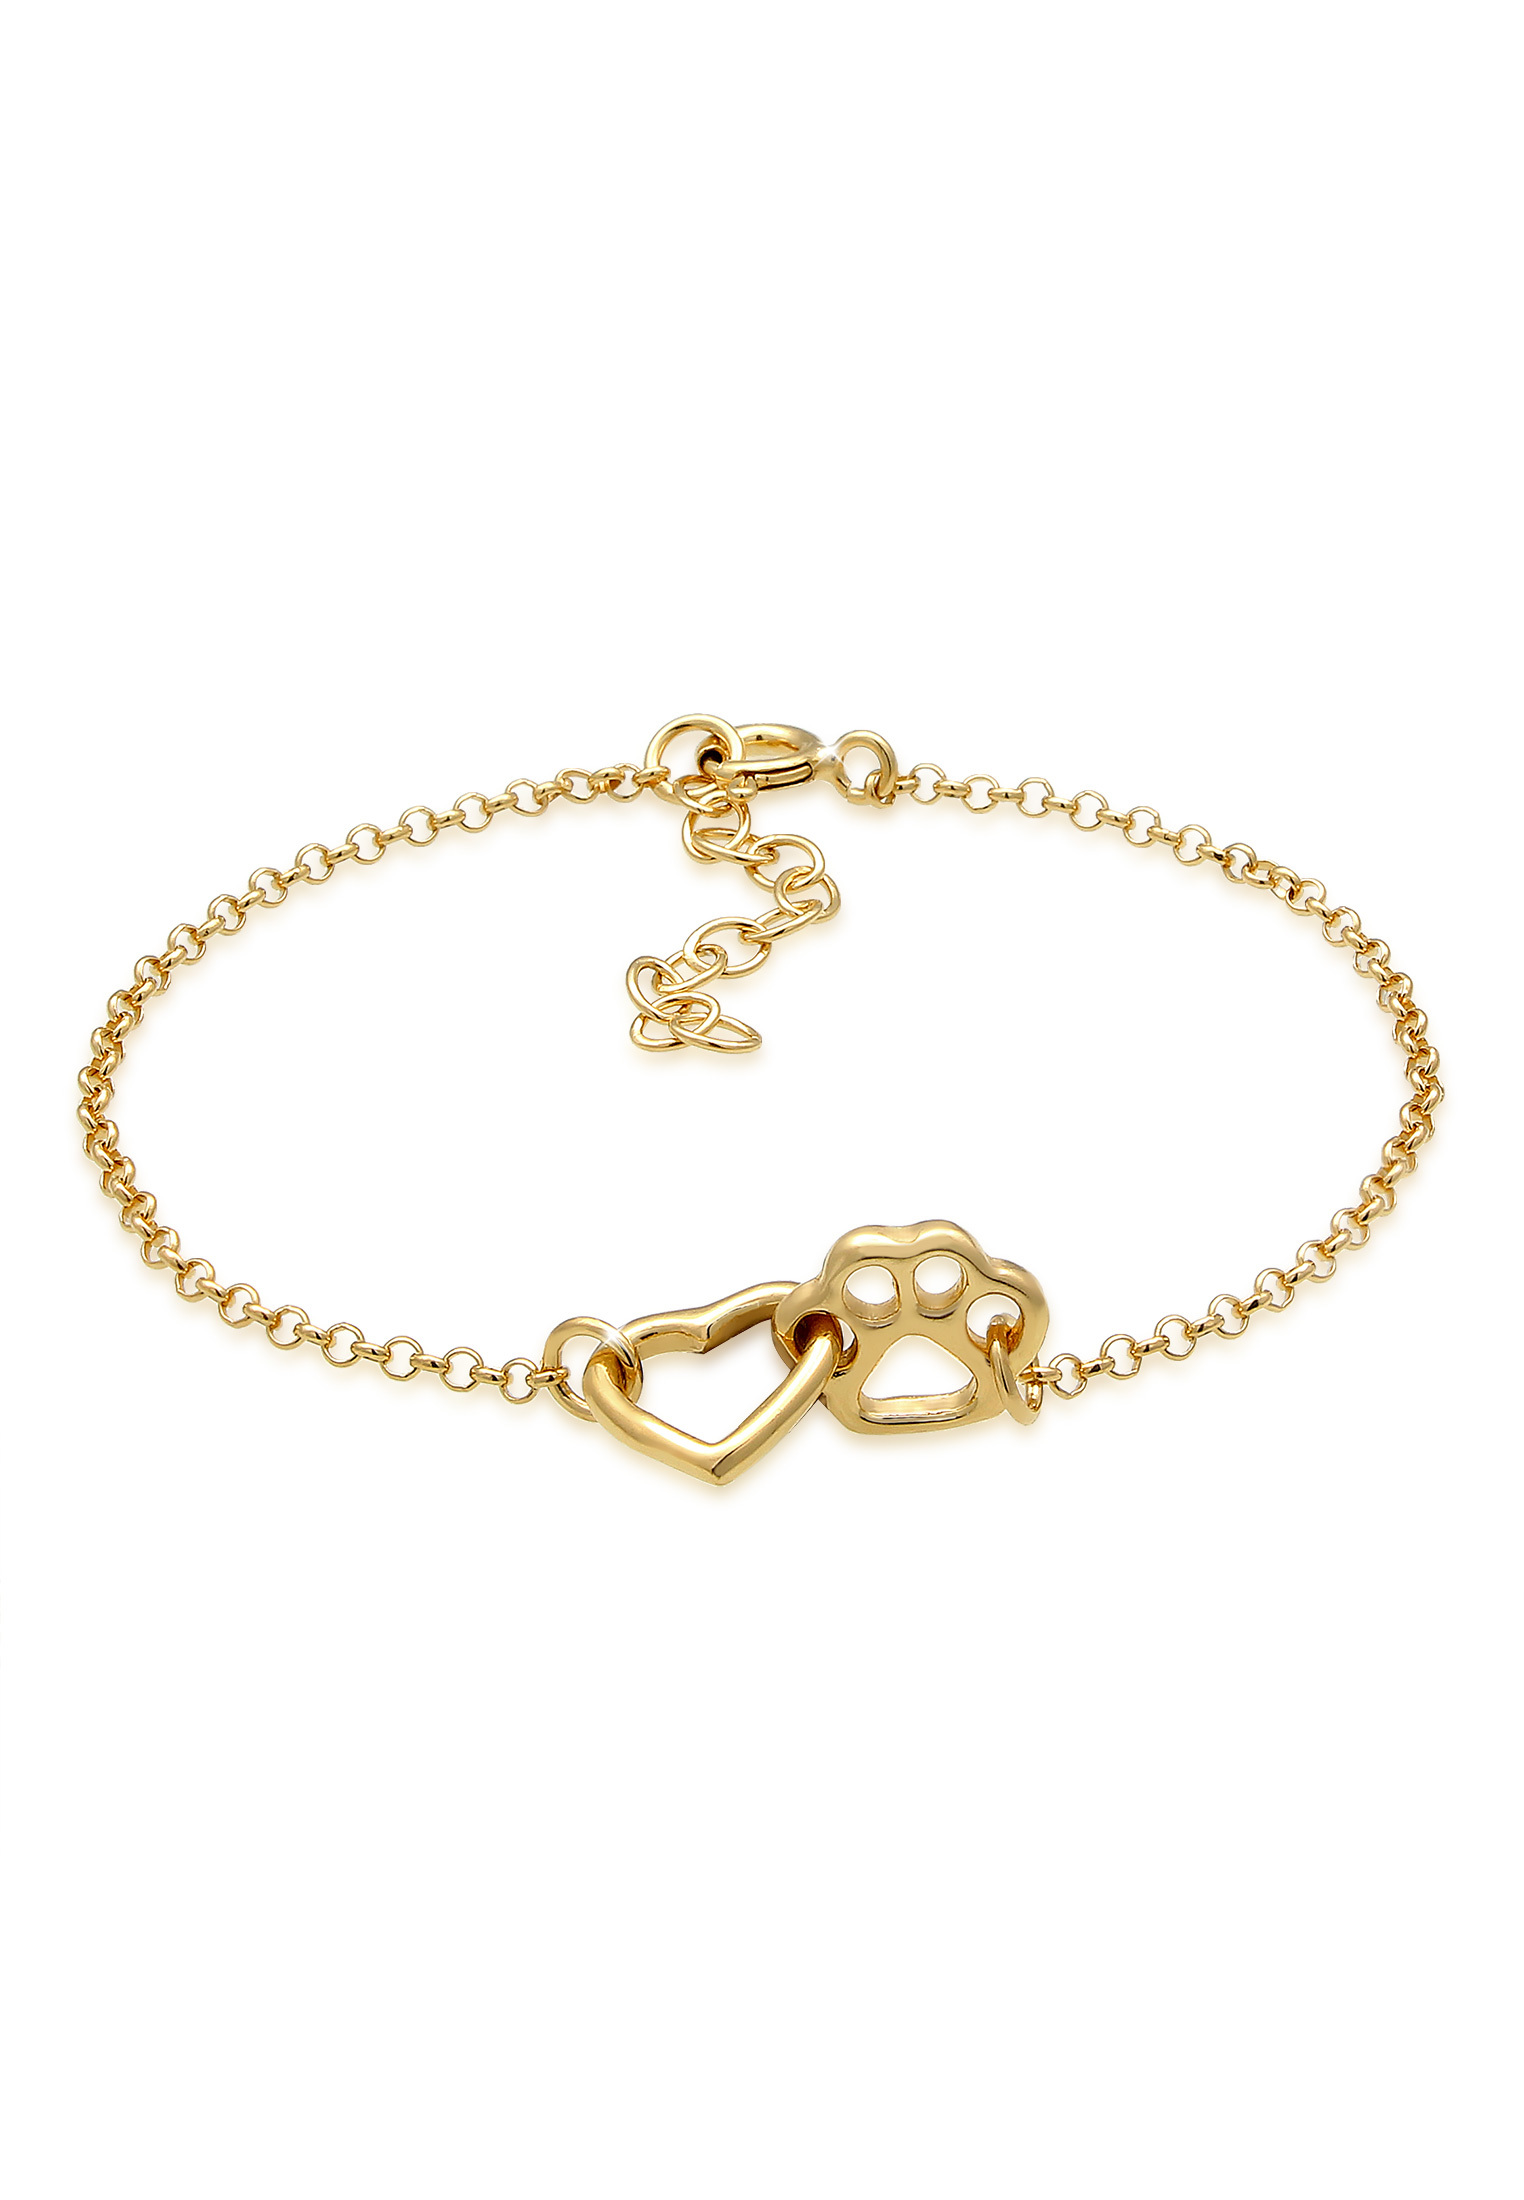 Armband Herz   925 Sterling Silber vergoldet